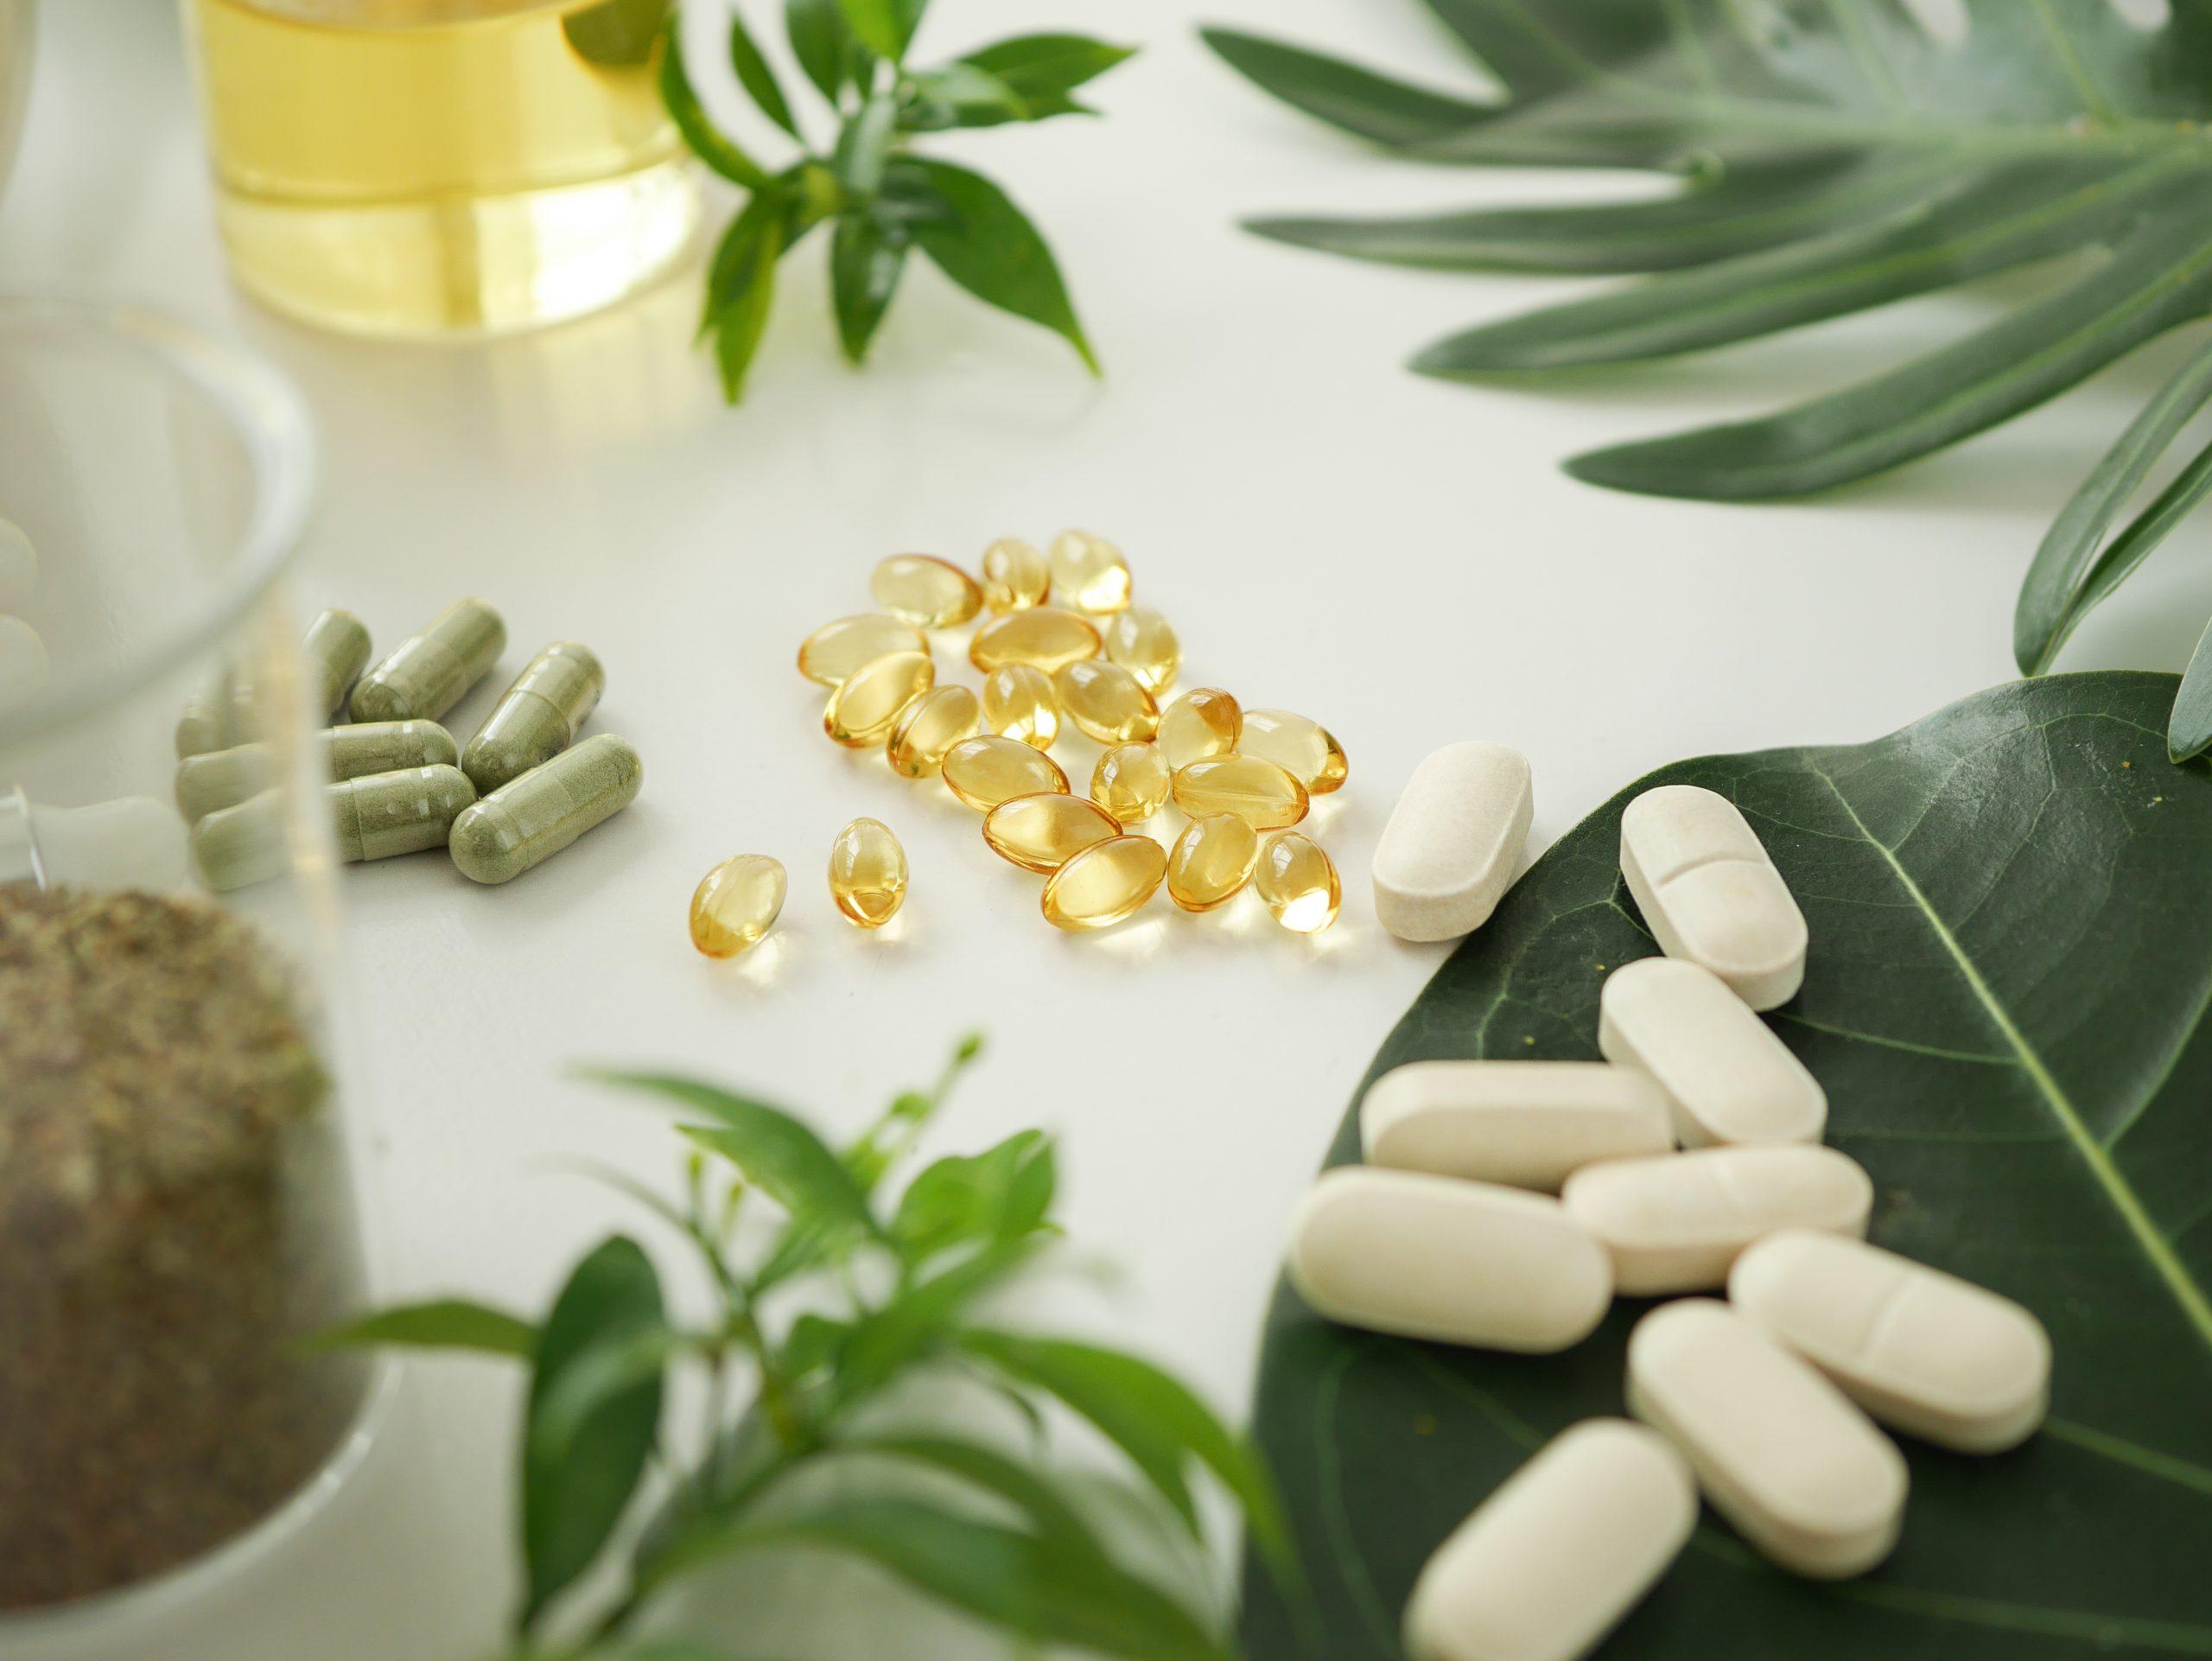 Natural herbal and holistic medicine